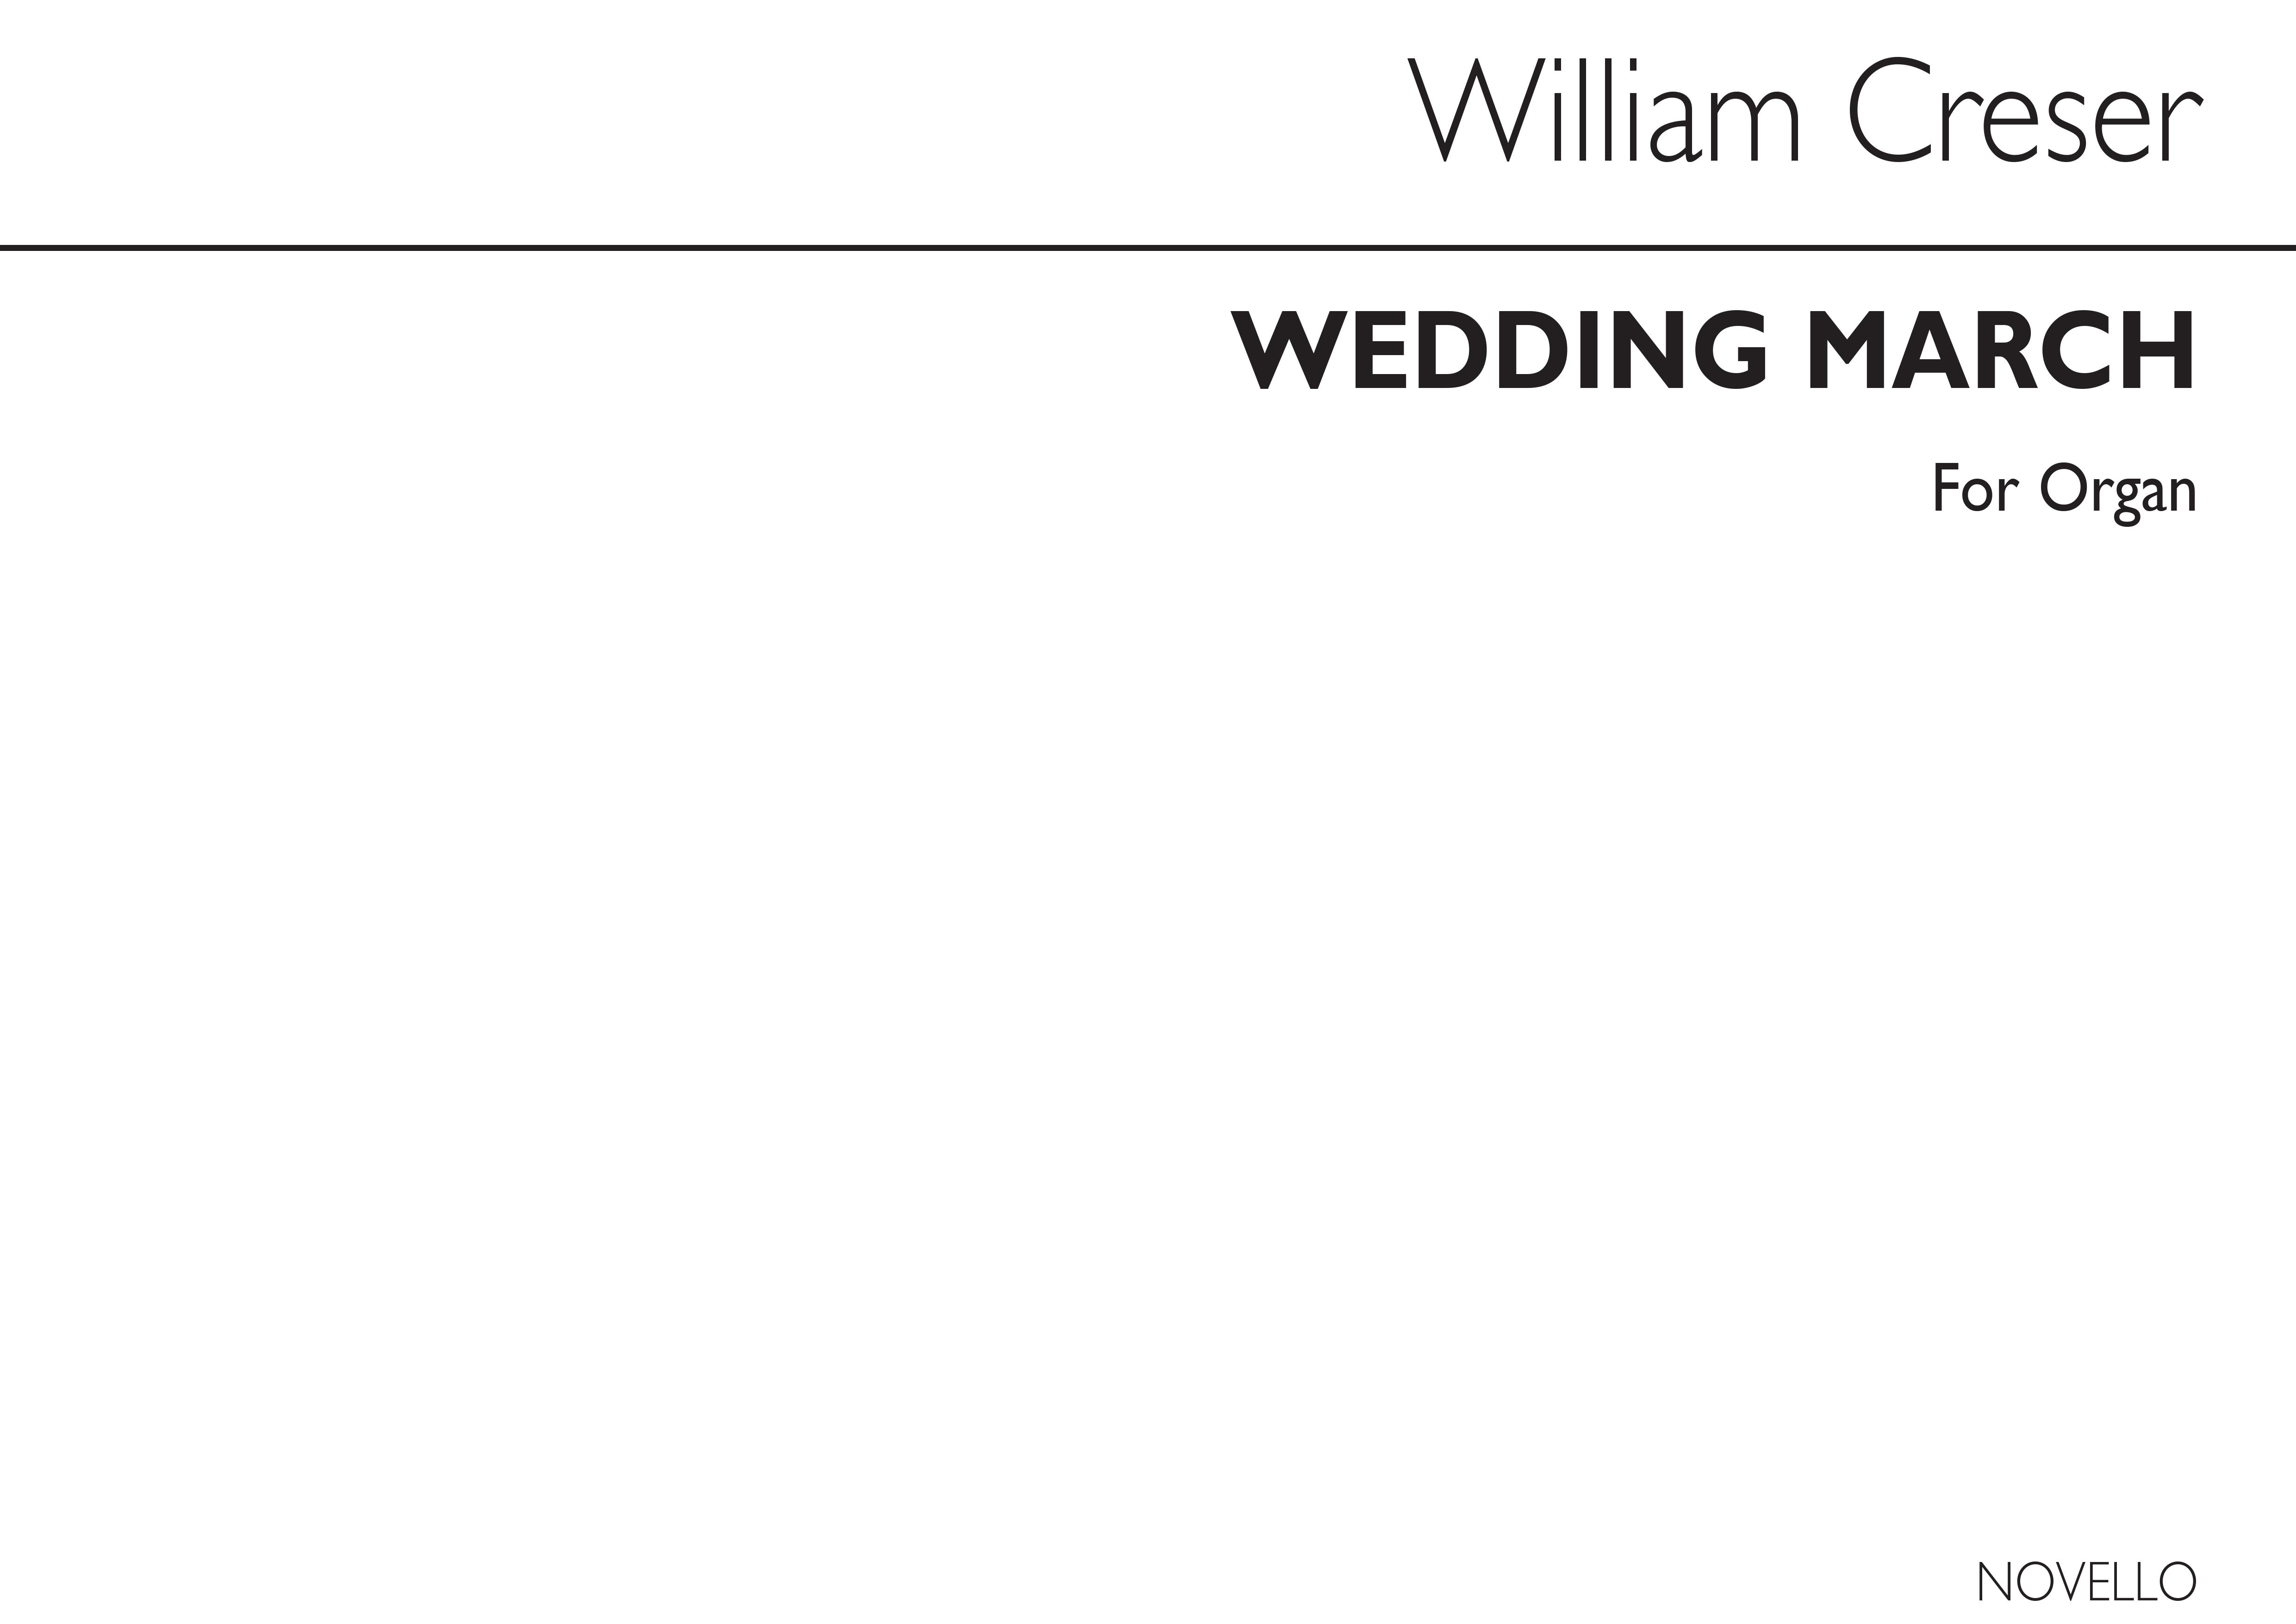 William Creser: Creser Wedding March Organ: Organ: Instrumental Work